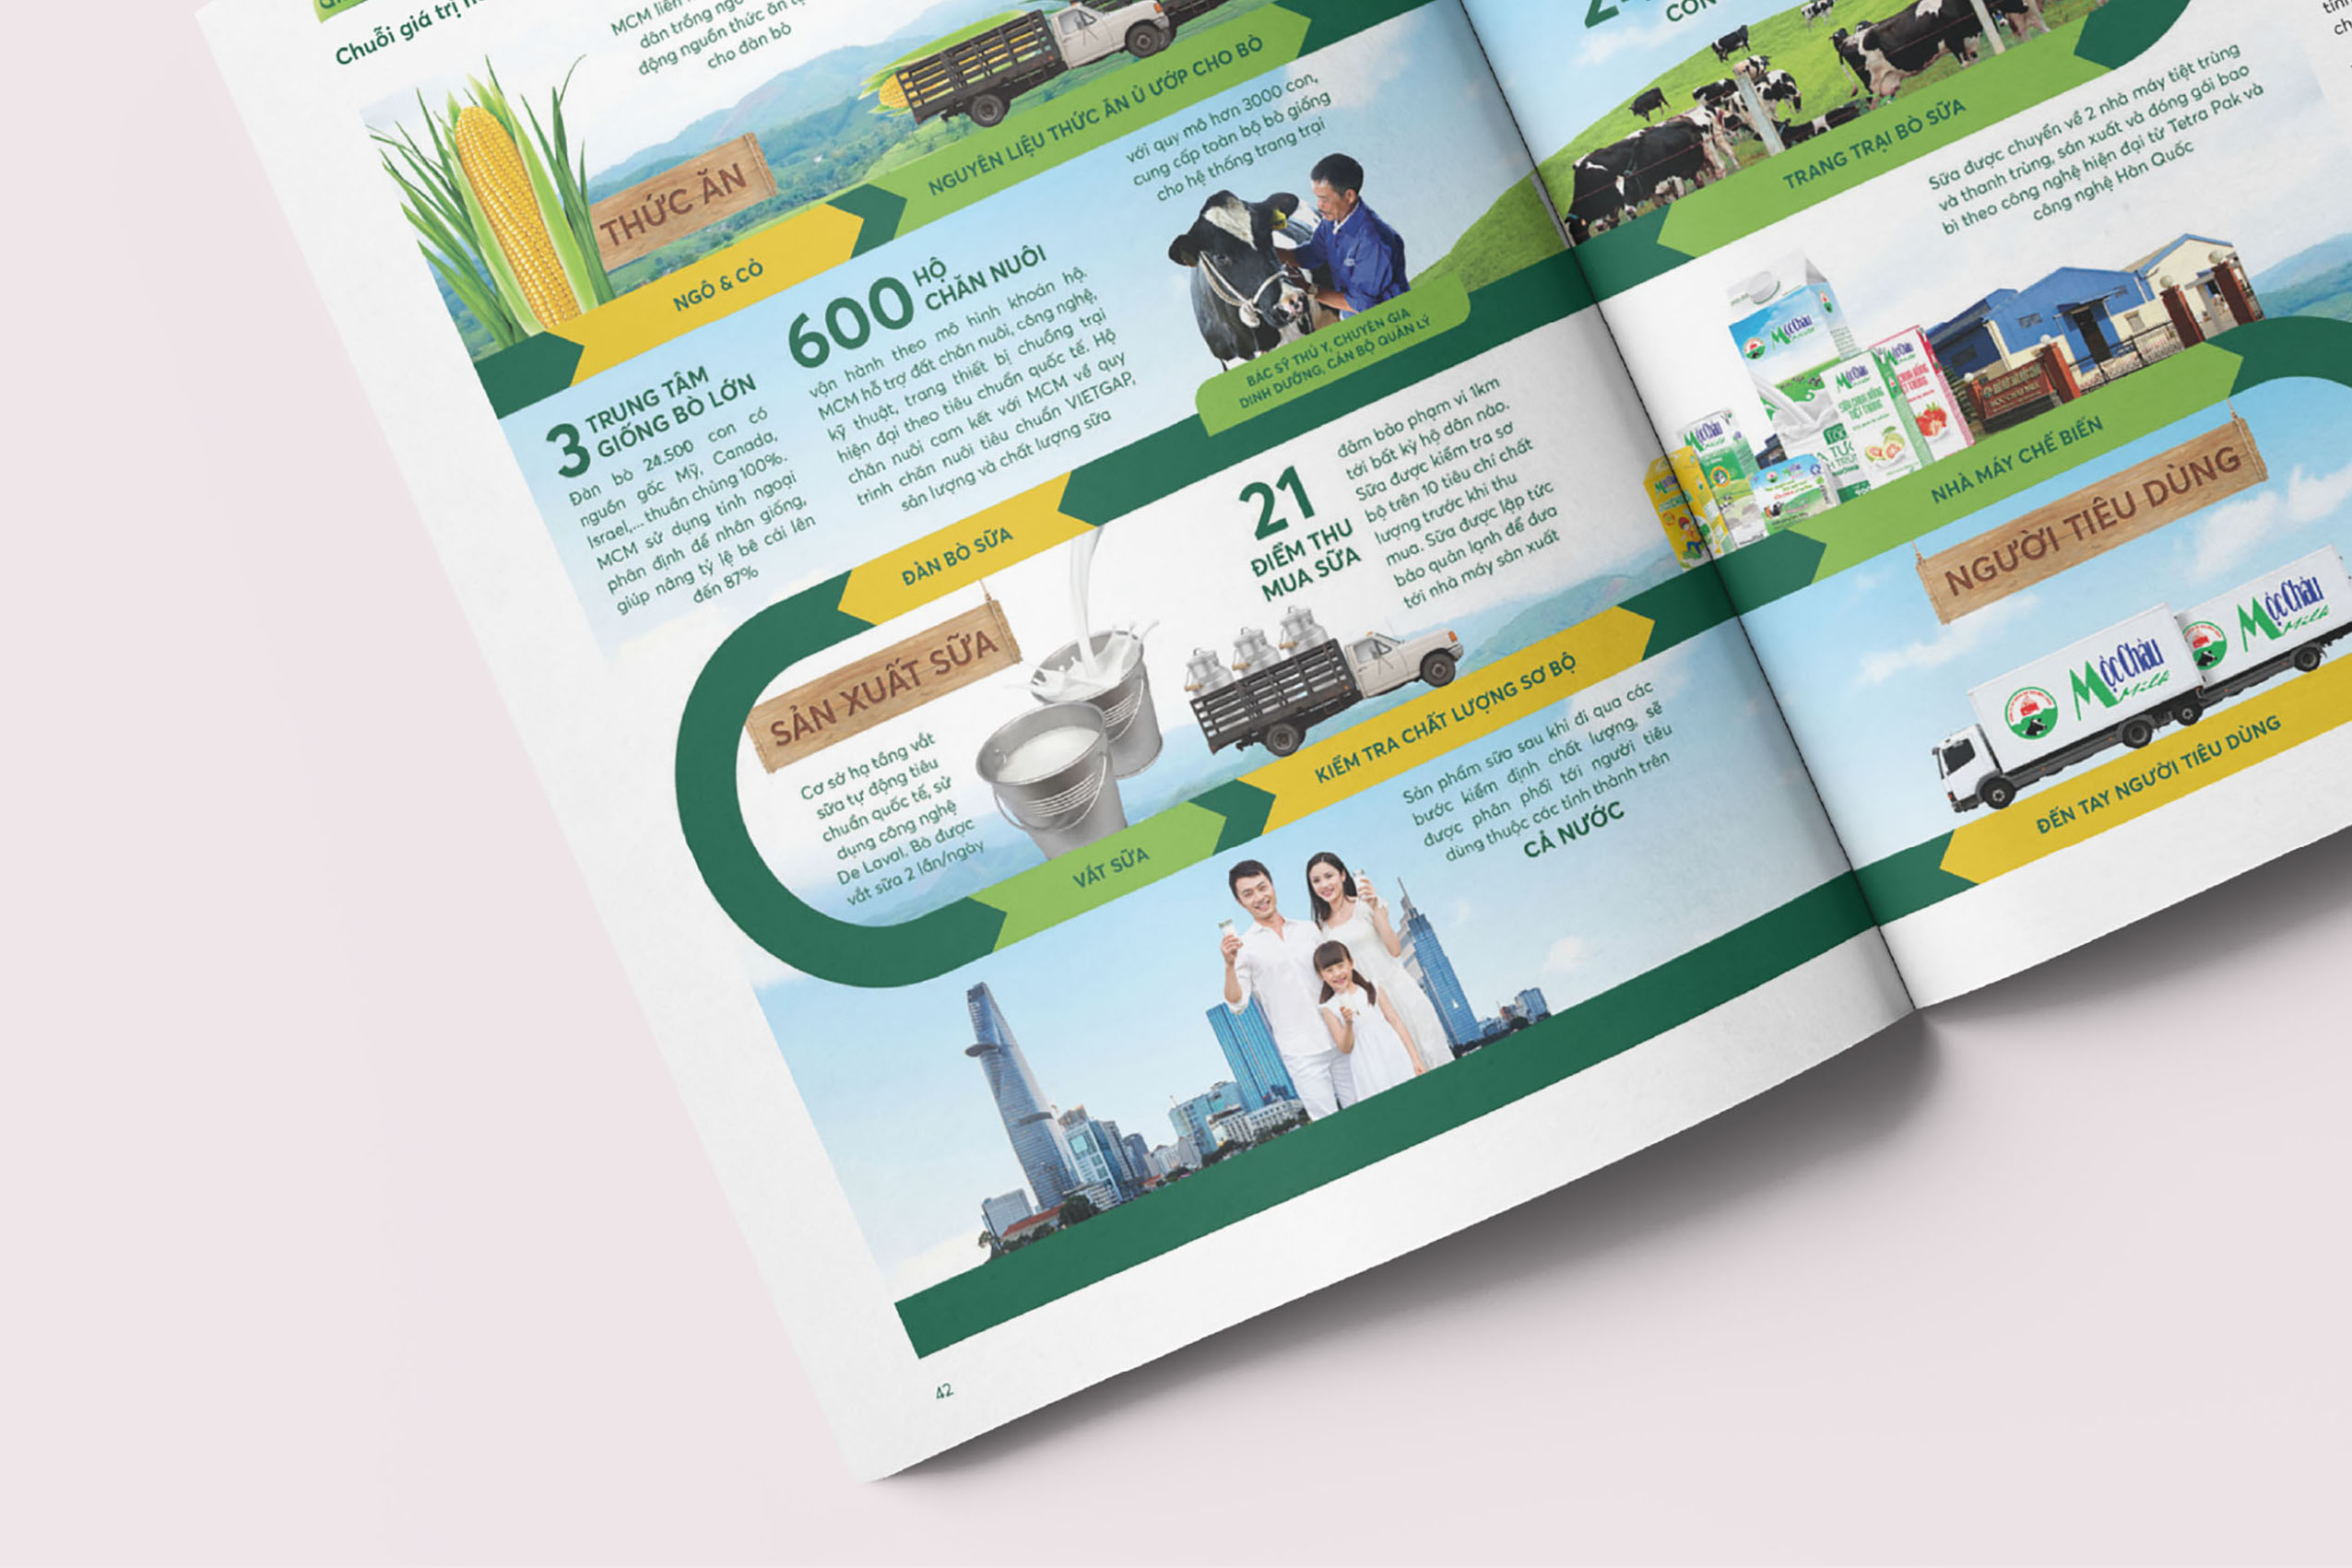 GTNfoods Annual Report 2018